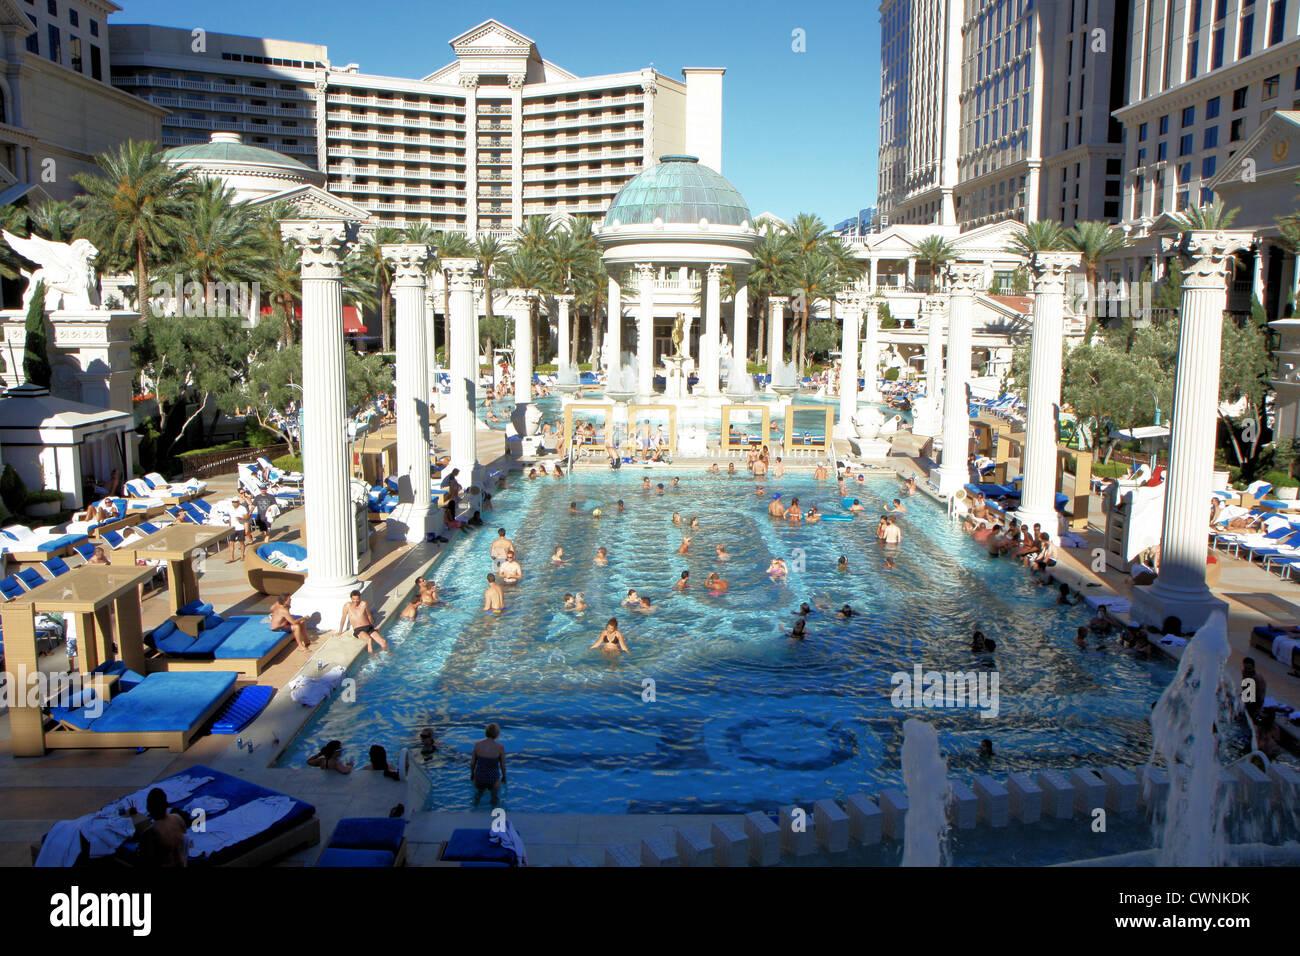 Caesars palace las vegas pool stock photos caesars for Caesars swimming pool